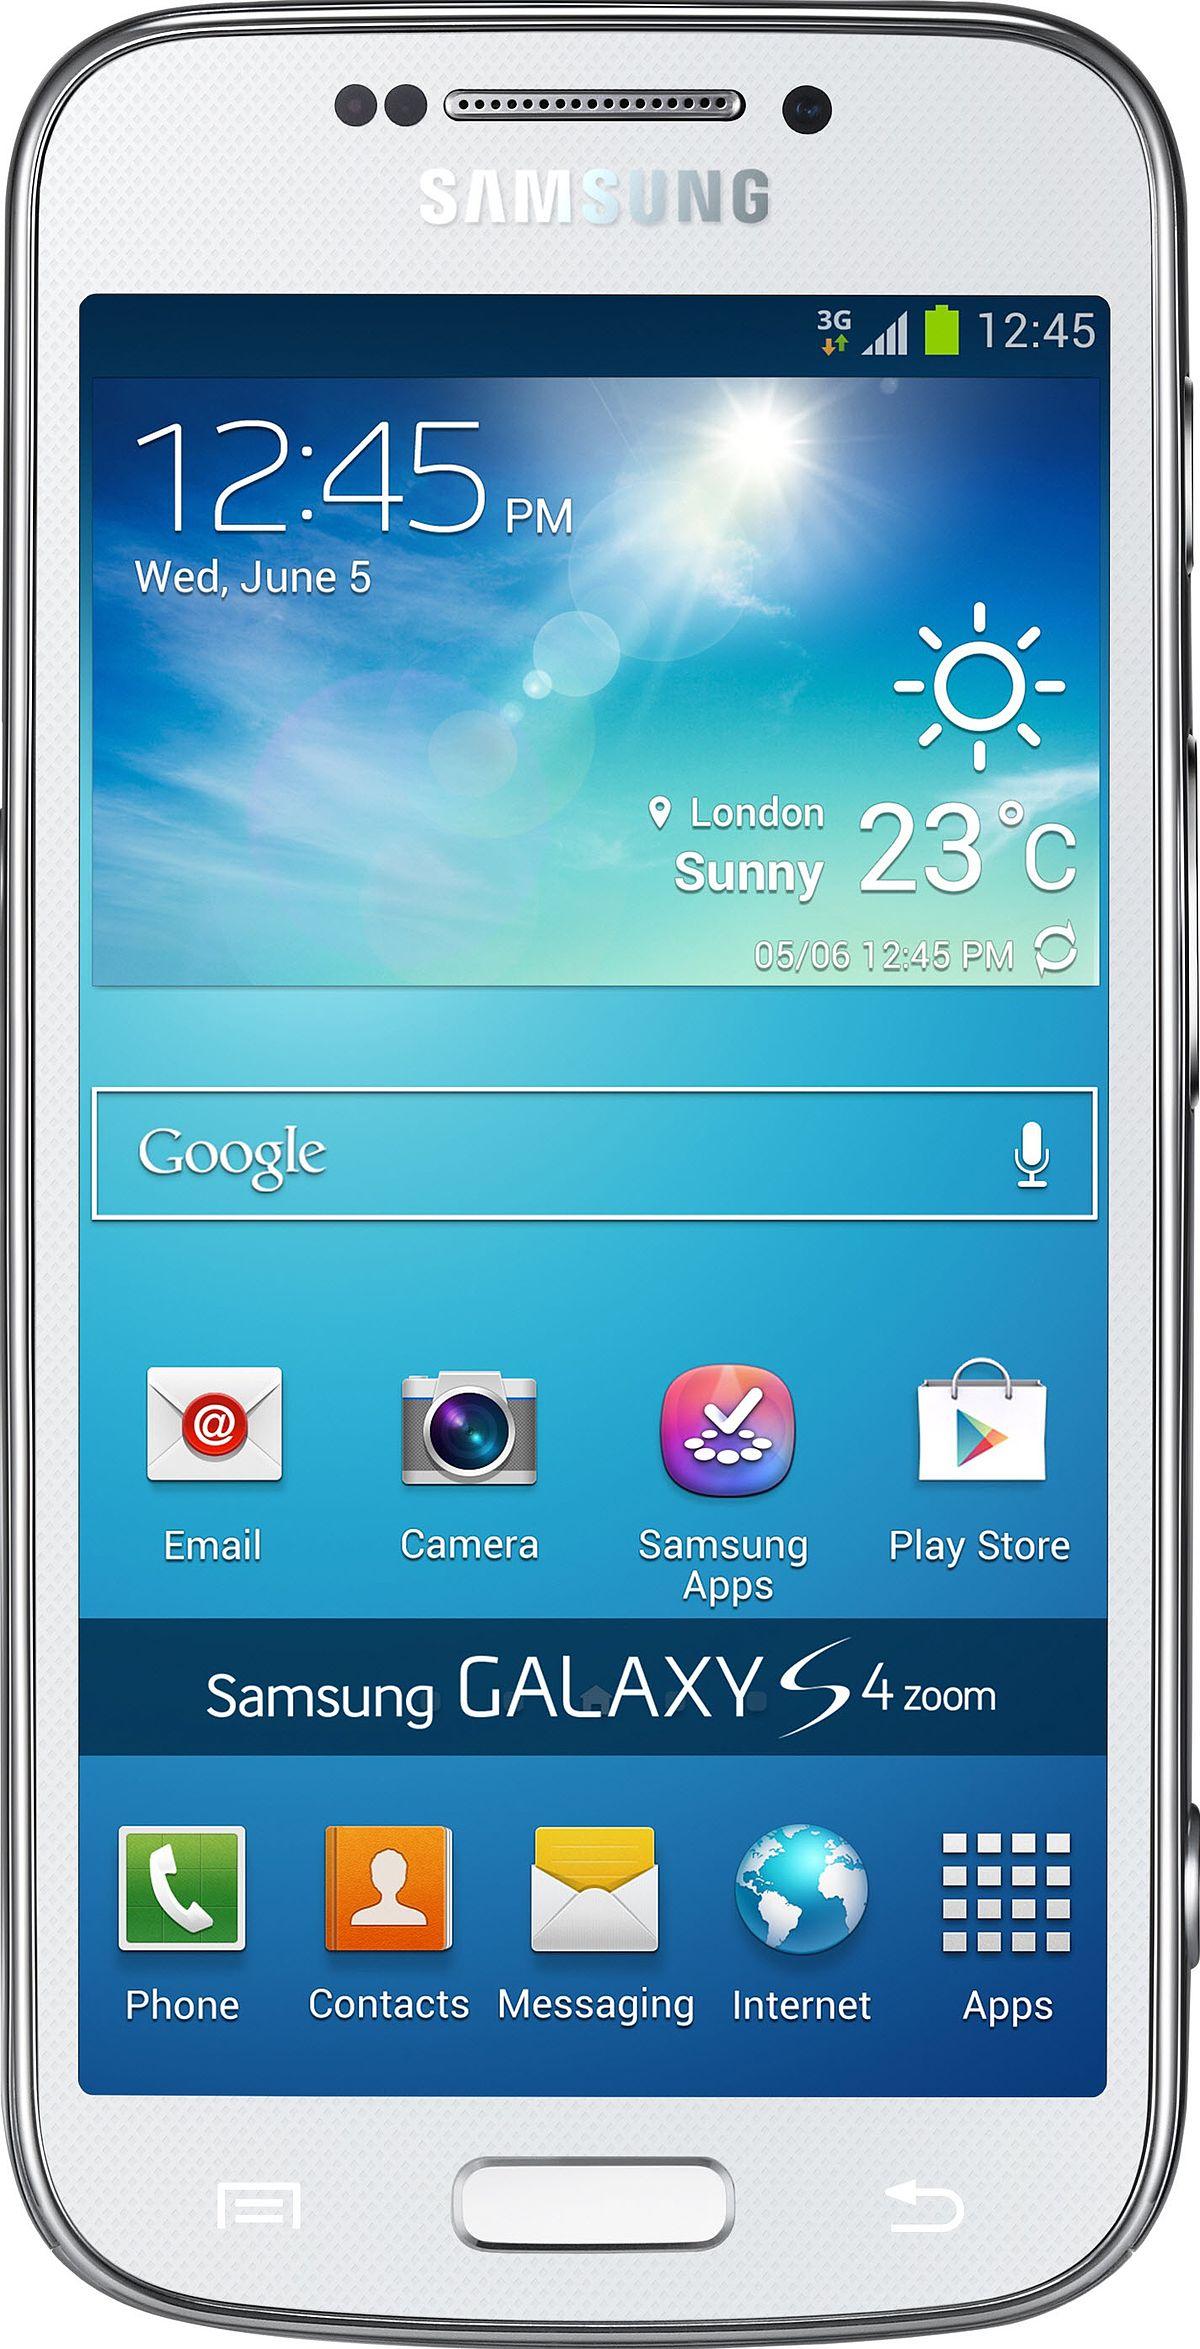 Samsung Galaxy S4 Zoom Wikipedia